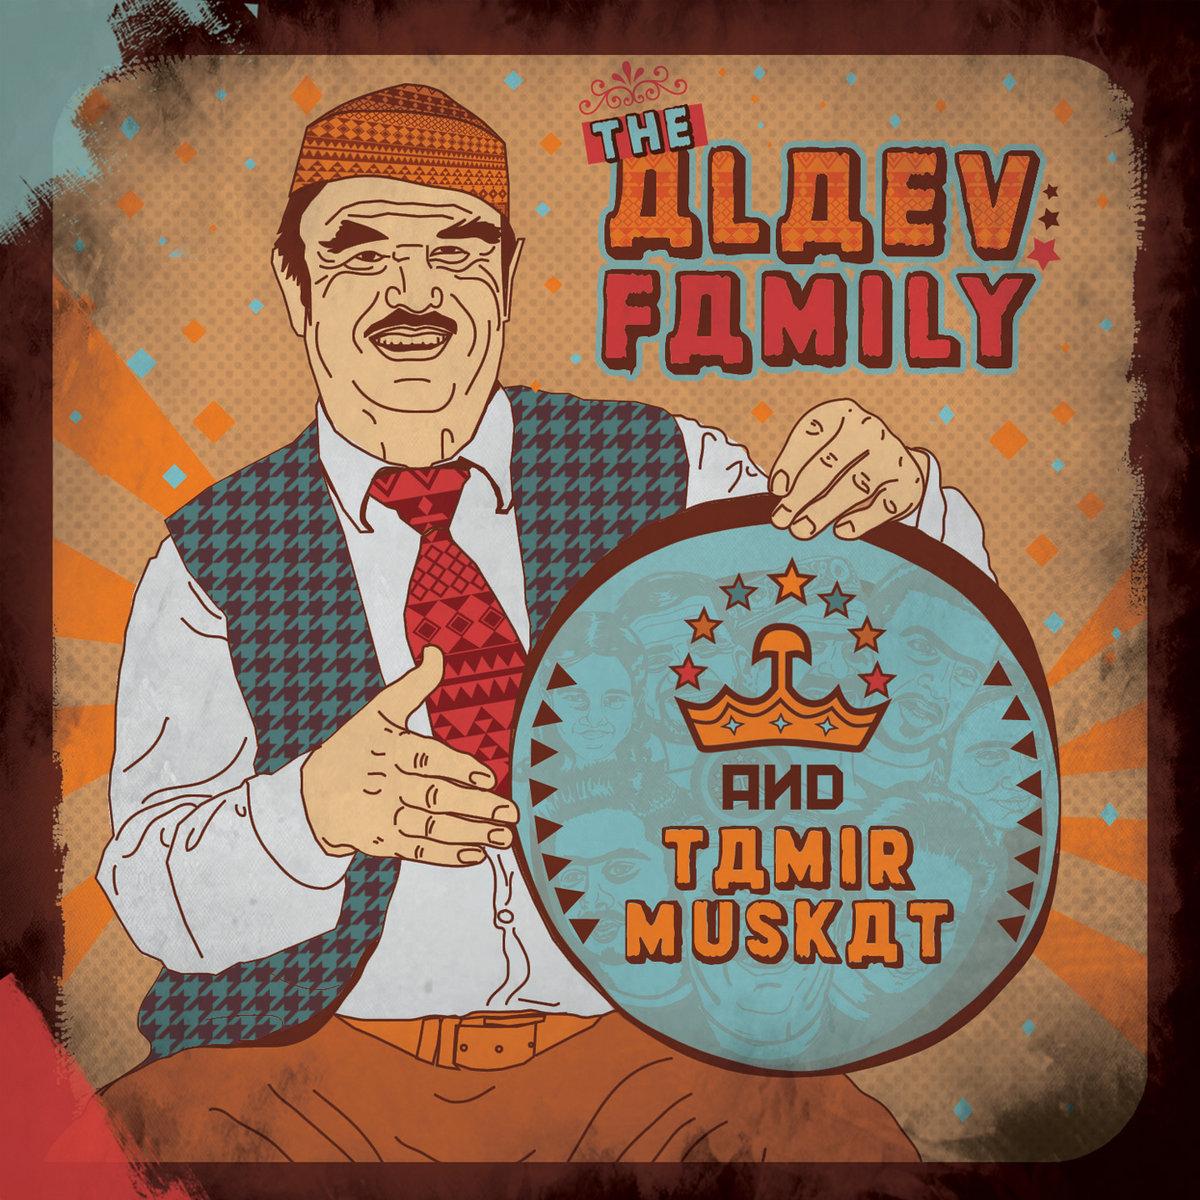 The Alaev Family&Tamir Muskat   The Alaev family & Tamir Muskat